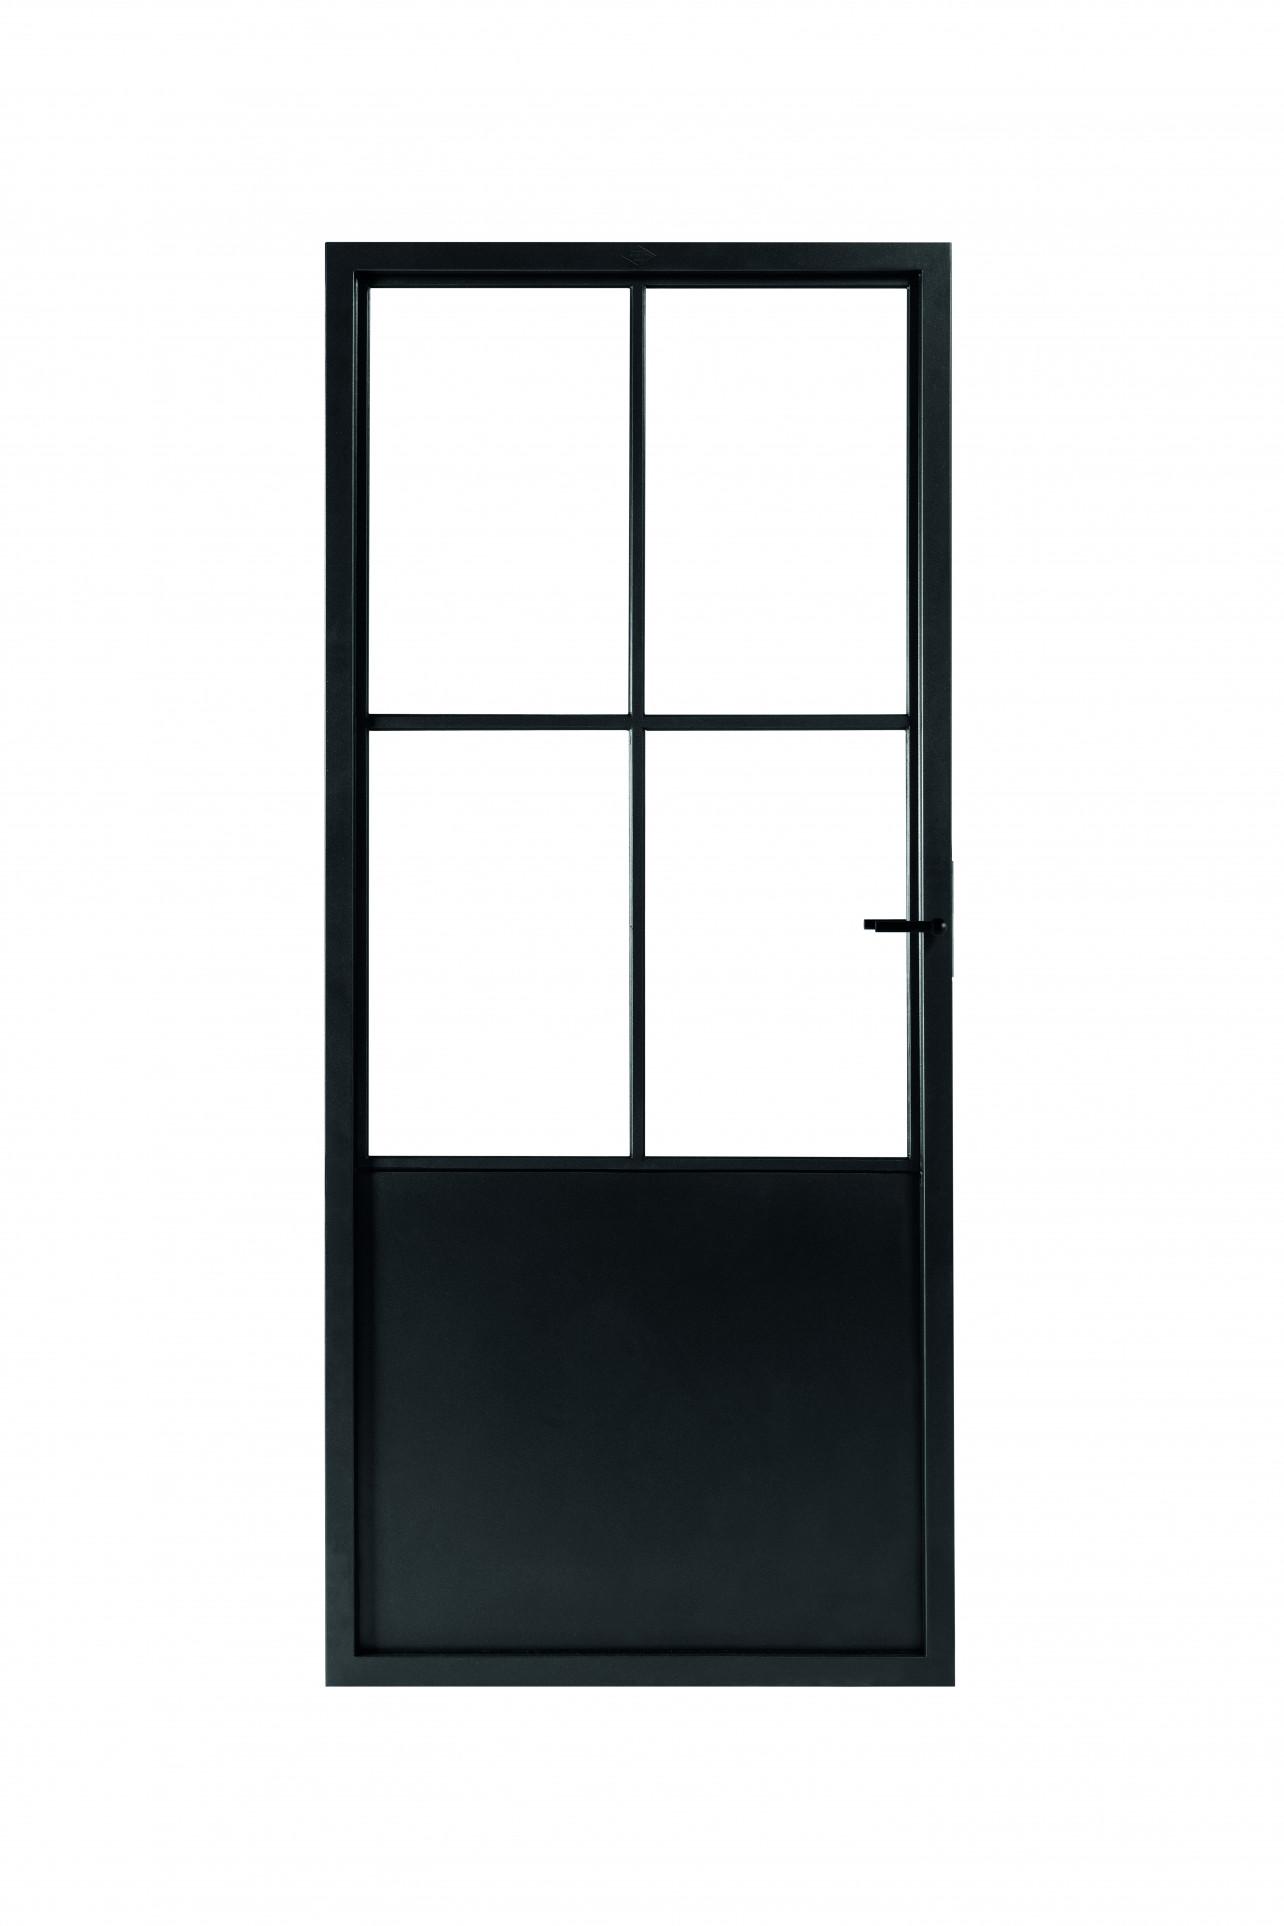 steelit-invisible-classic4-enkel.jpg